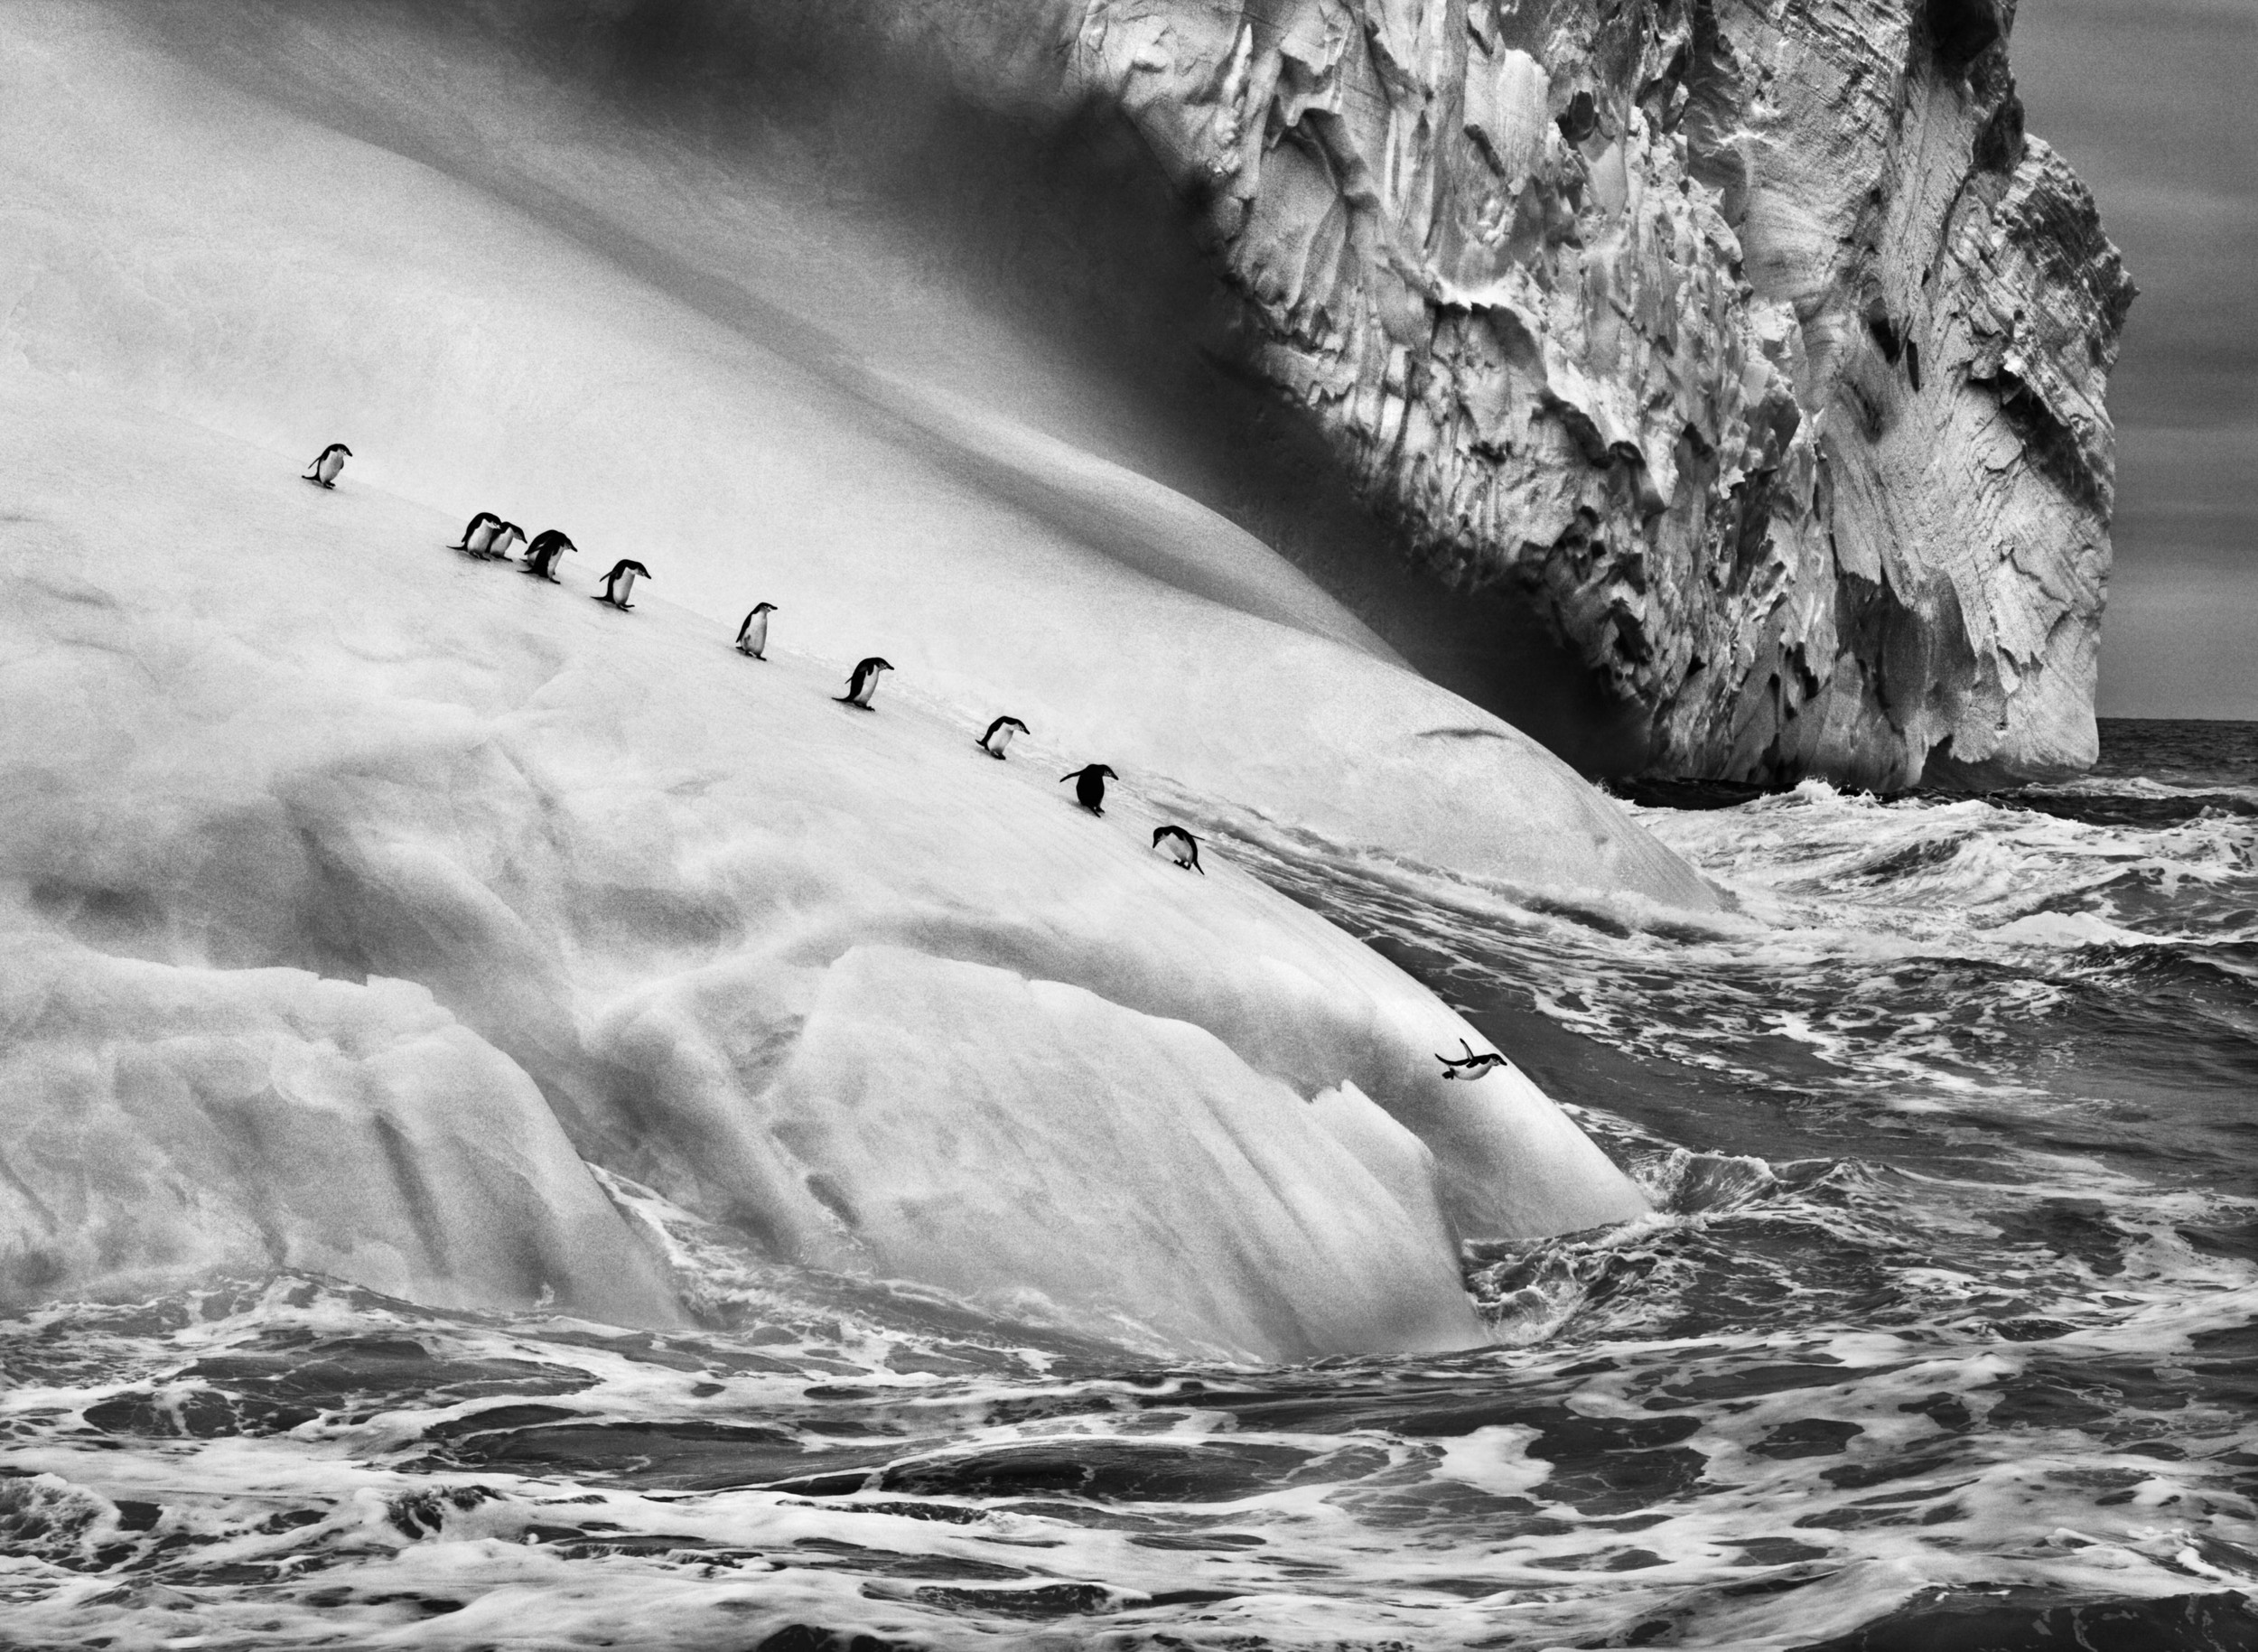 © Sebastião Salgado/Amazonas Images/Contrasto